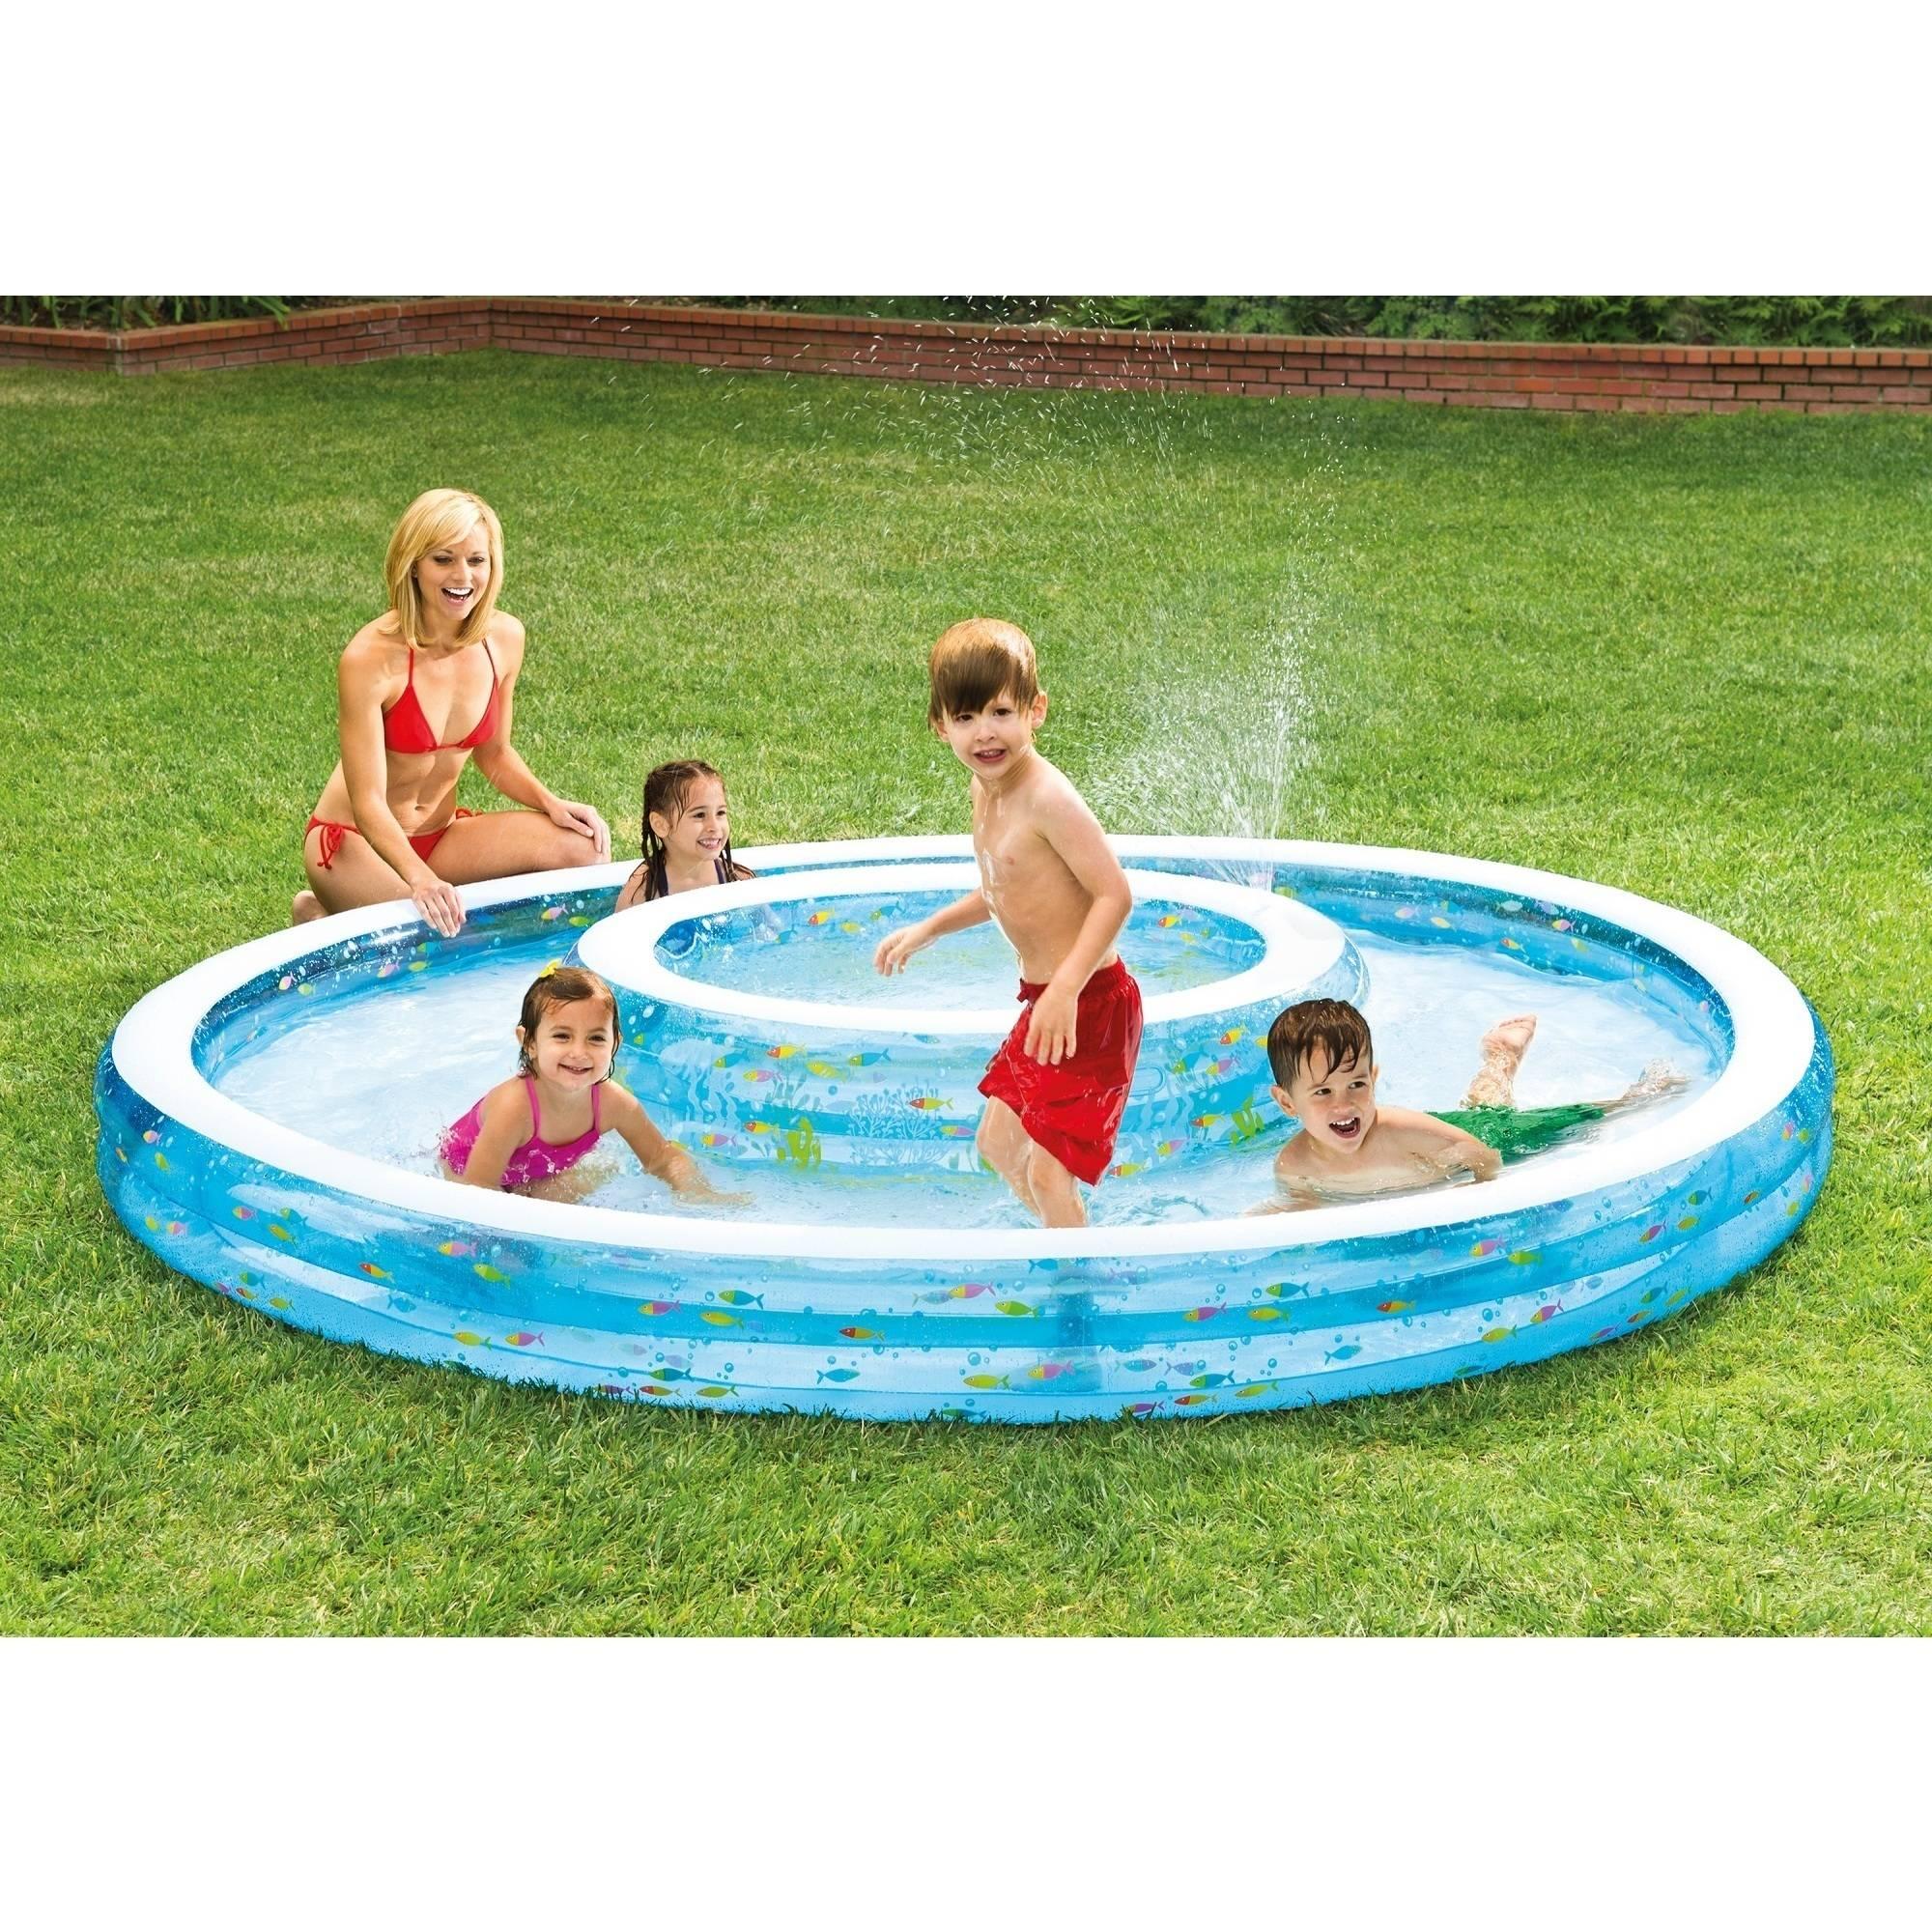 Rectangle Inflatable Pool intex inflatable wishing well pool with sprayer - walmart